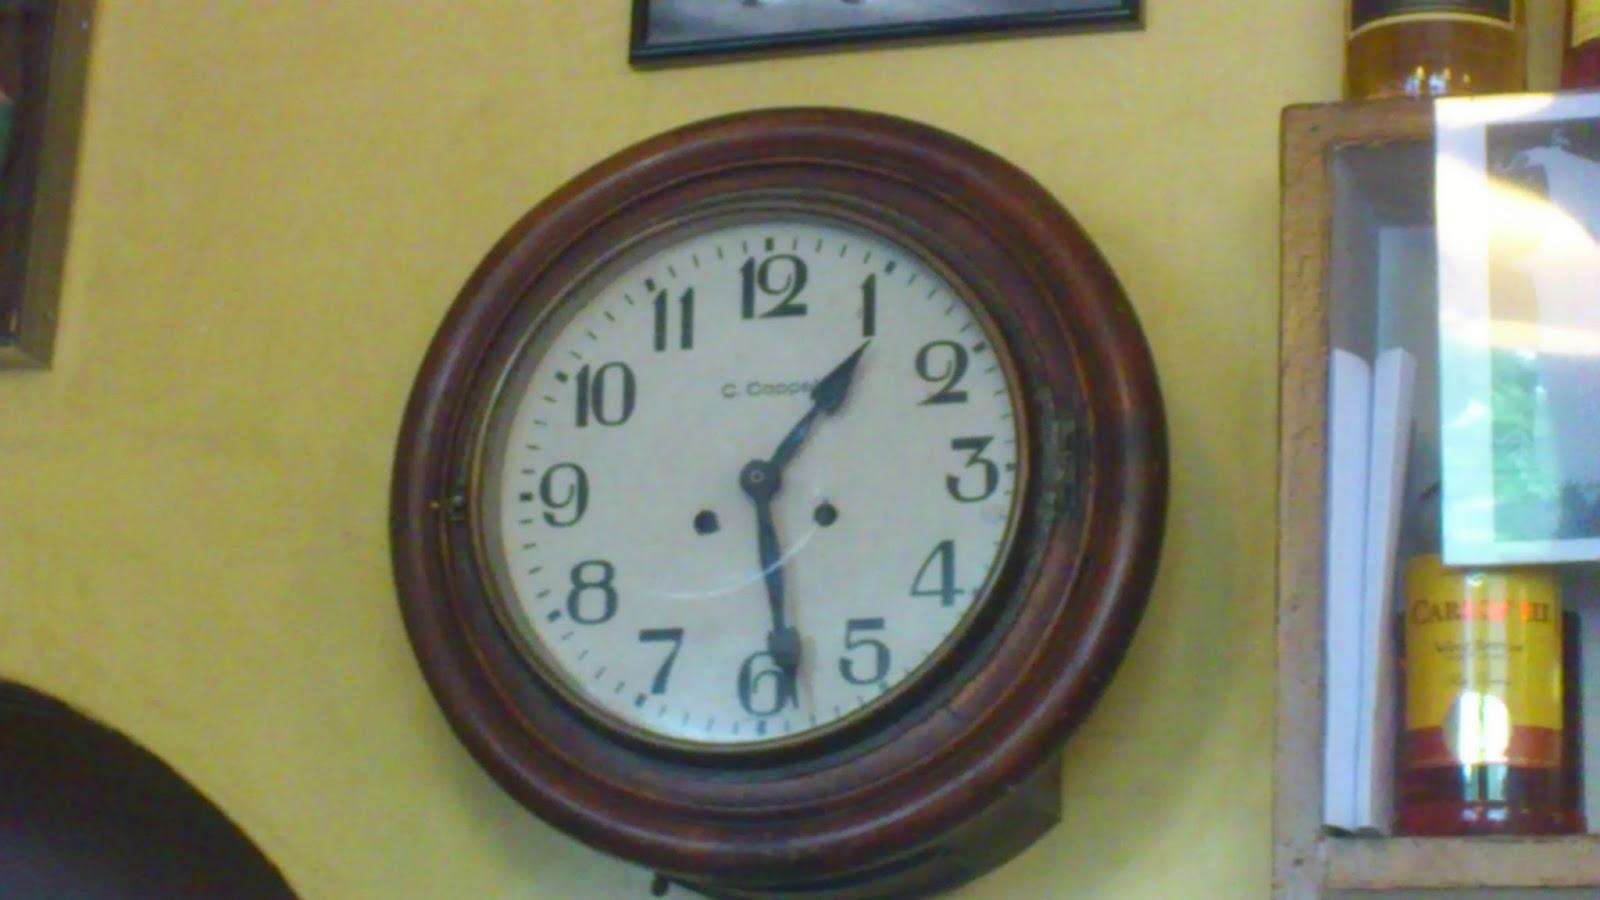 Madridmetropolis detalles de madrid la otra colecci n - Relojes de pared ...